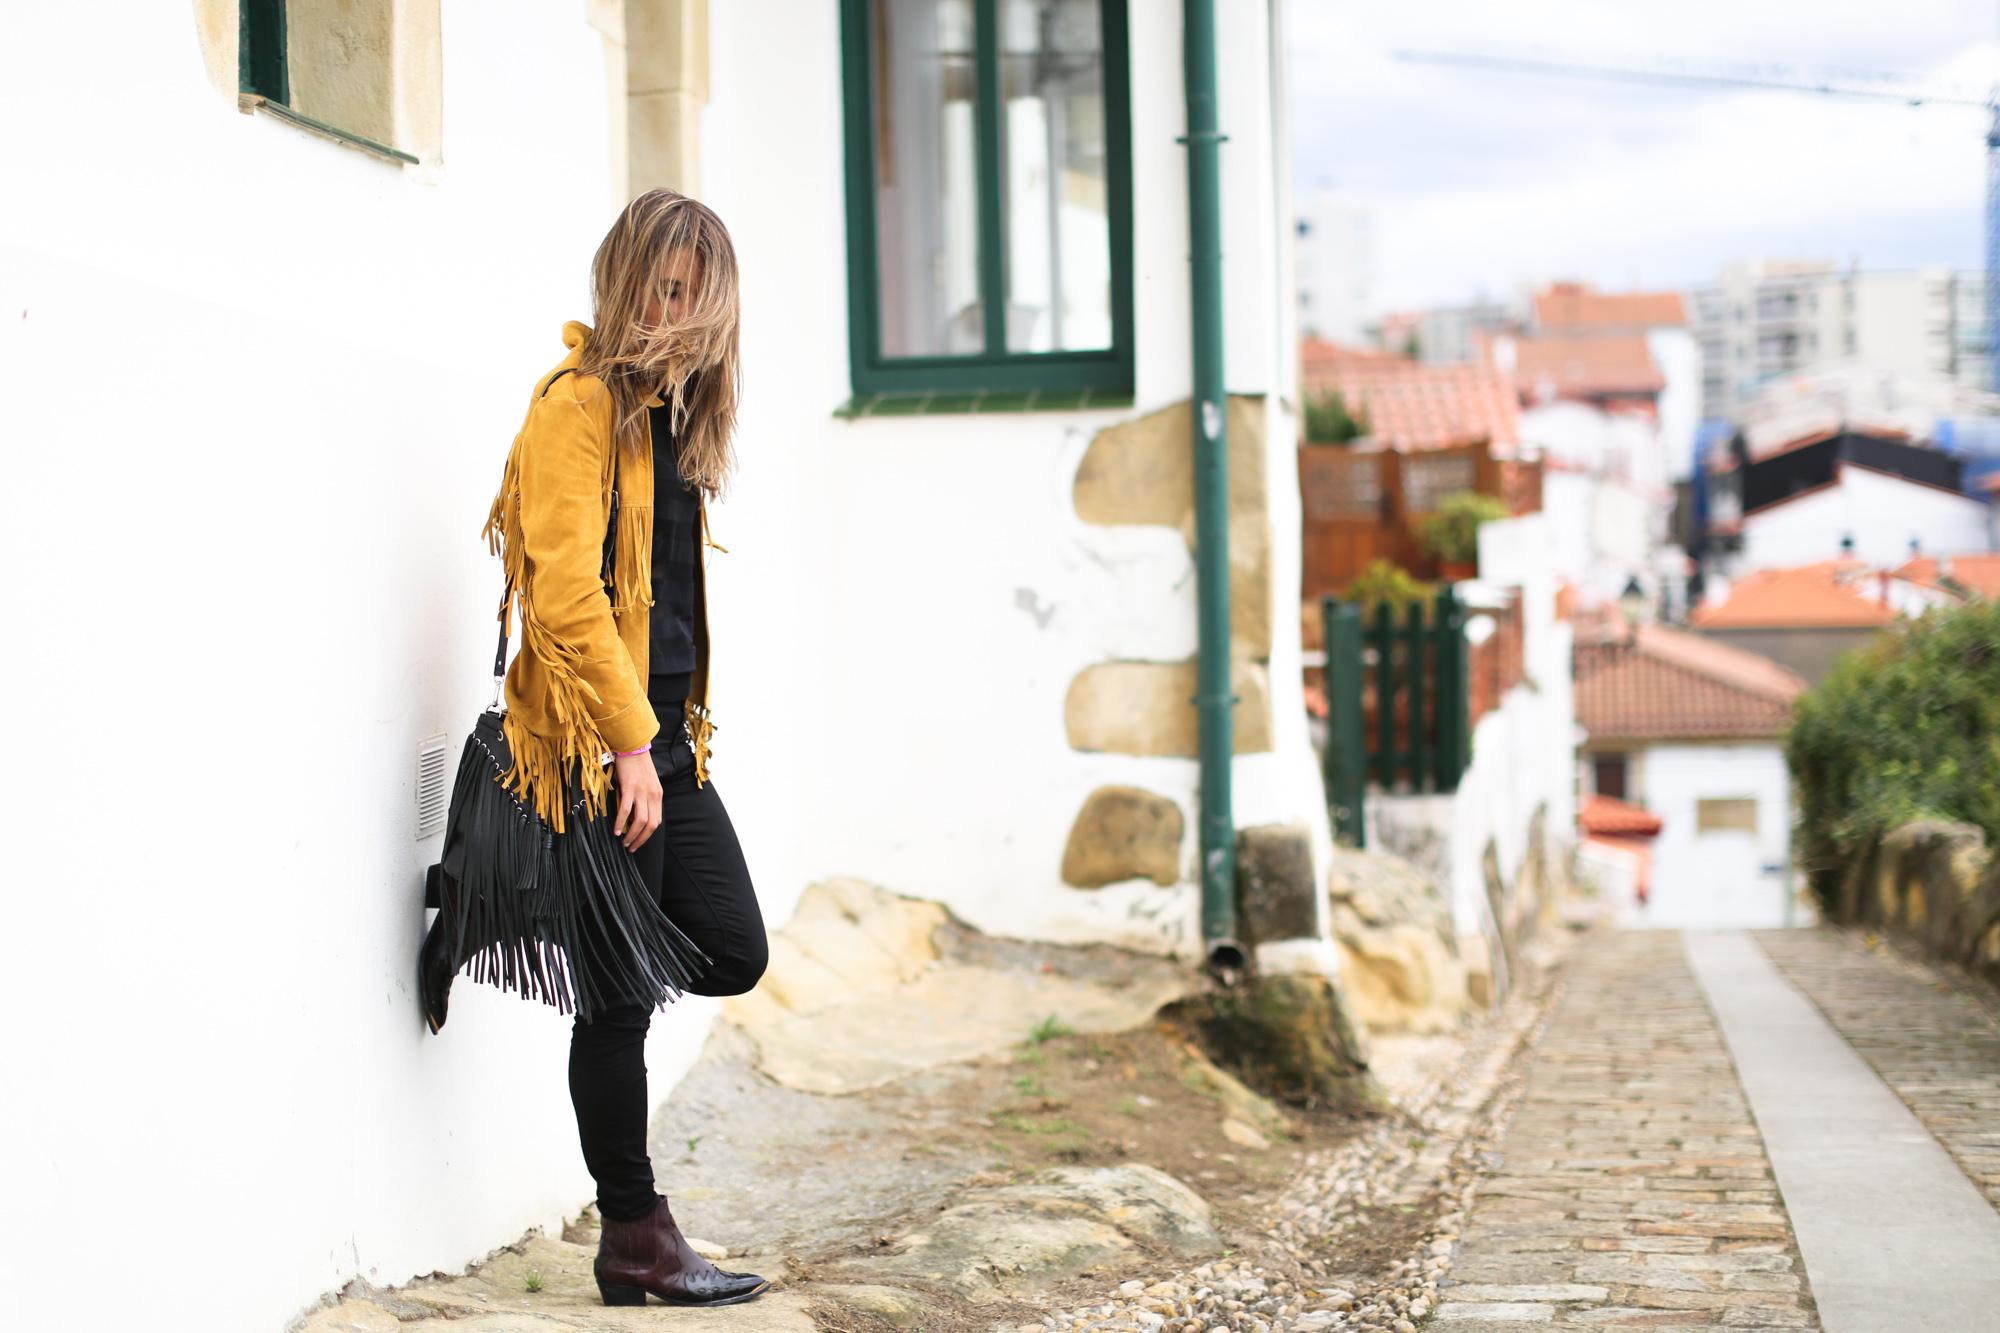 Clochet_Streetstyle_zara_yellow_suede_fringed_jacket-3